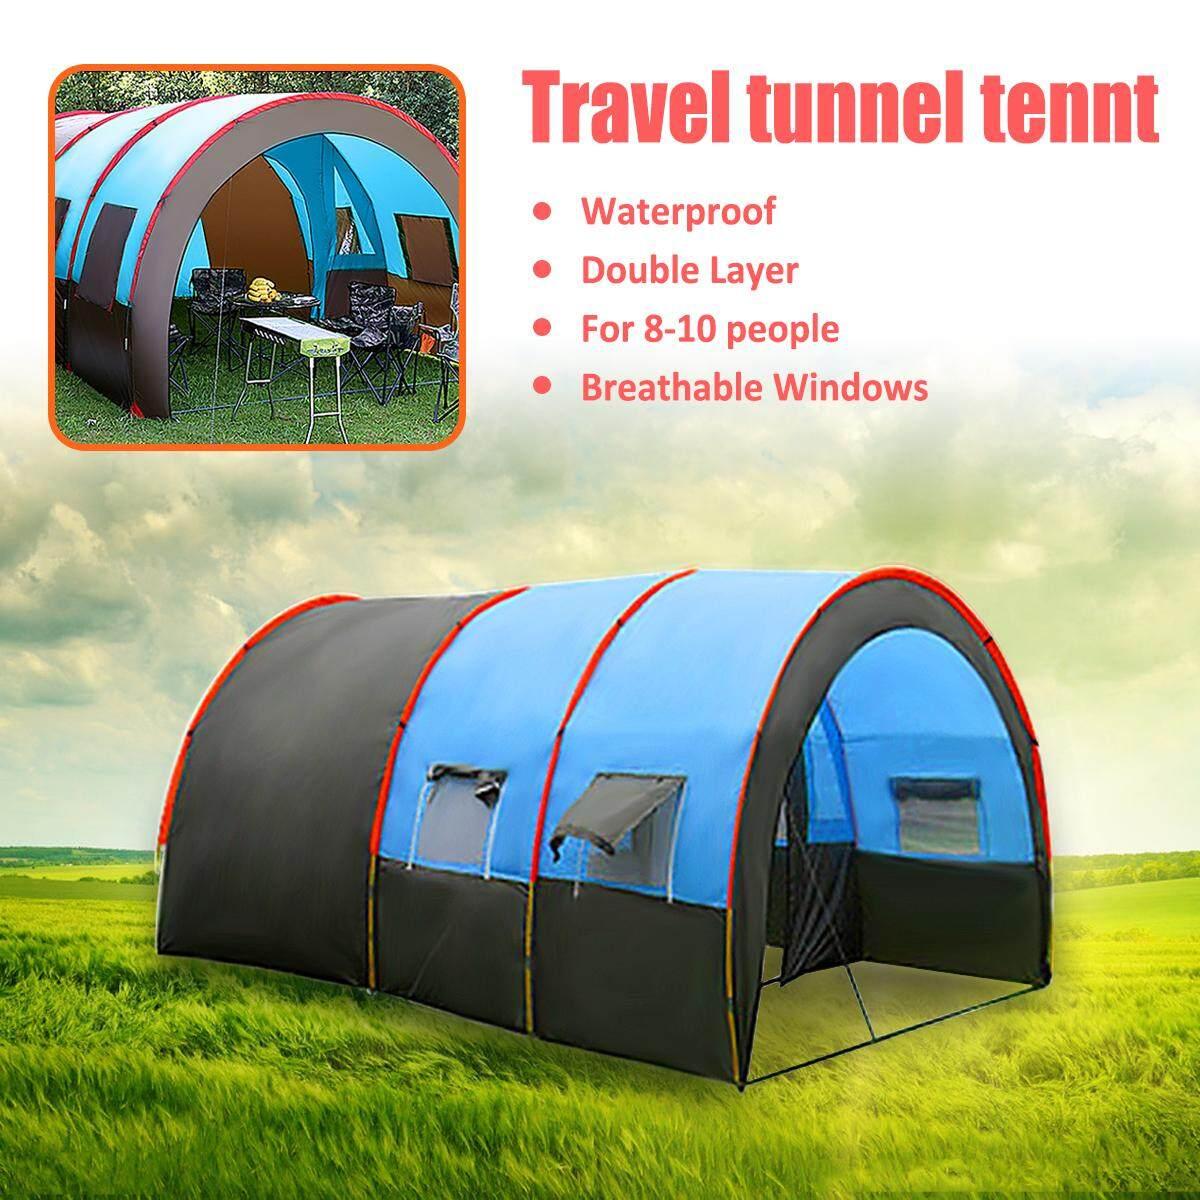 Tenda Camping Berkemah Rumah Hellokitty Sedang 8 10 Orang Tahan Air Luar Ruangan Liburan Besar Dua Lapisan Kami